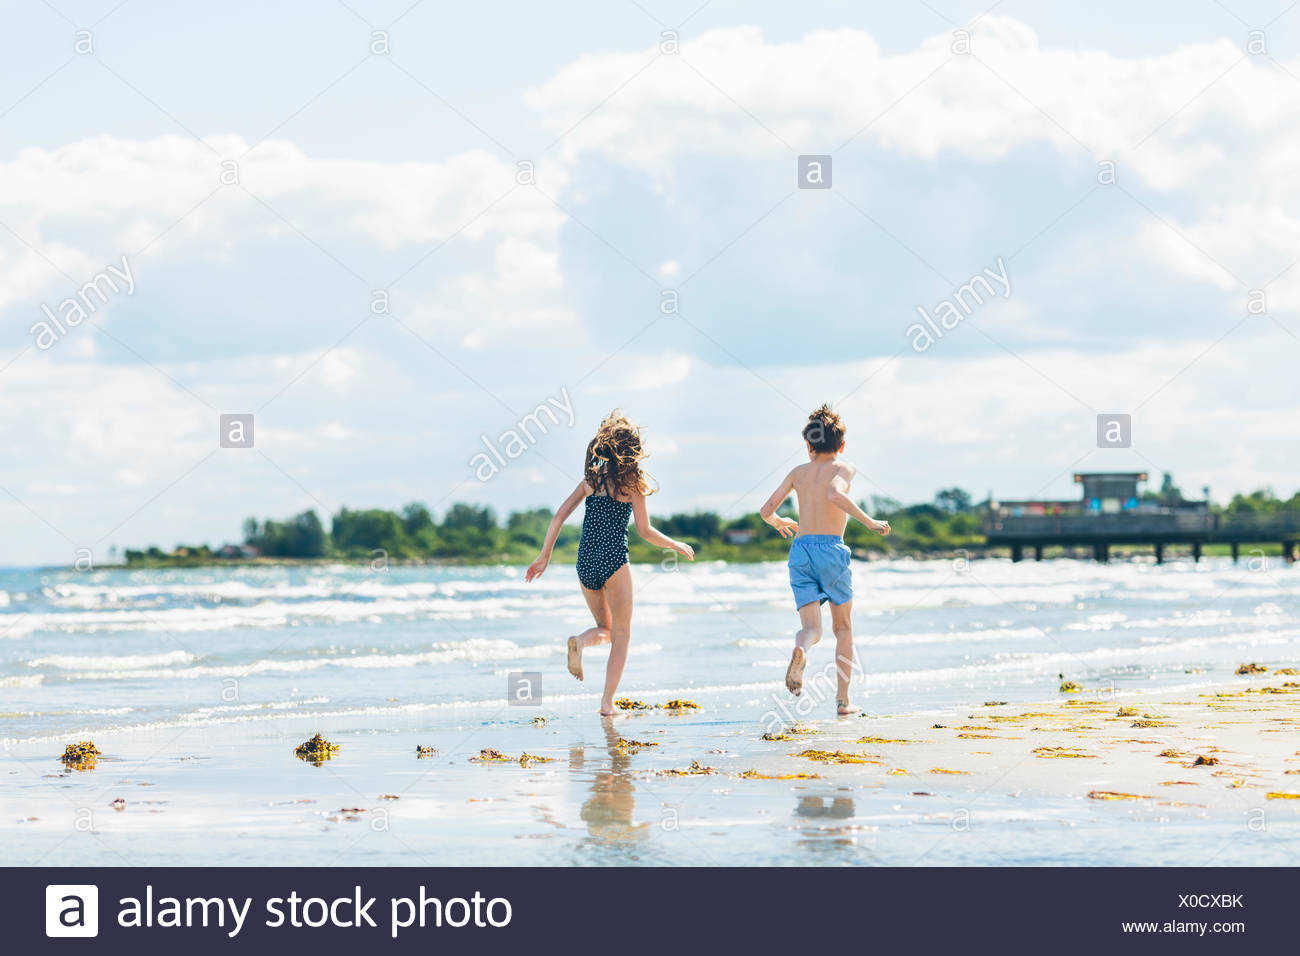 Girl (10-11) and boy (8-9) running on beach - Stock Image